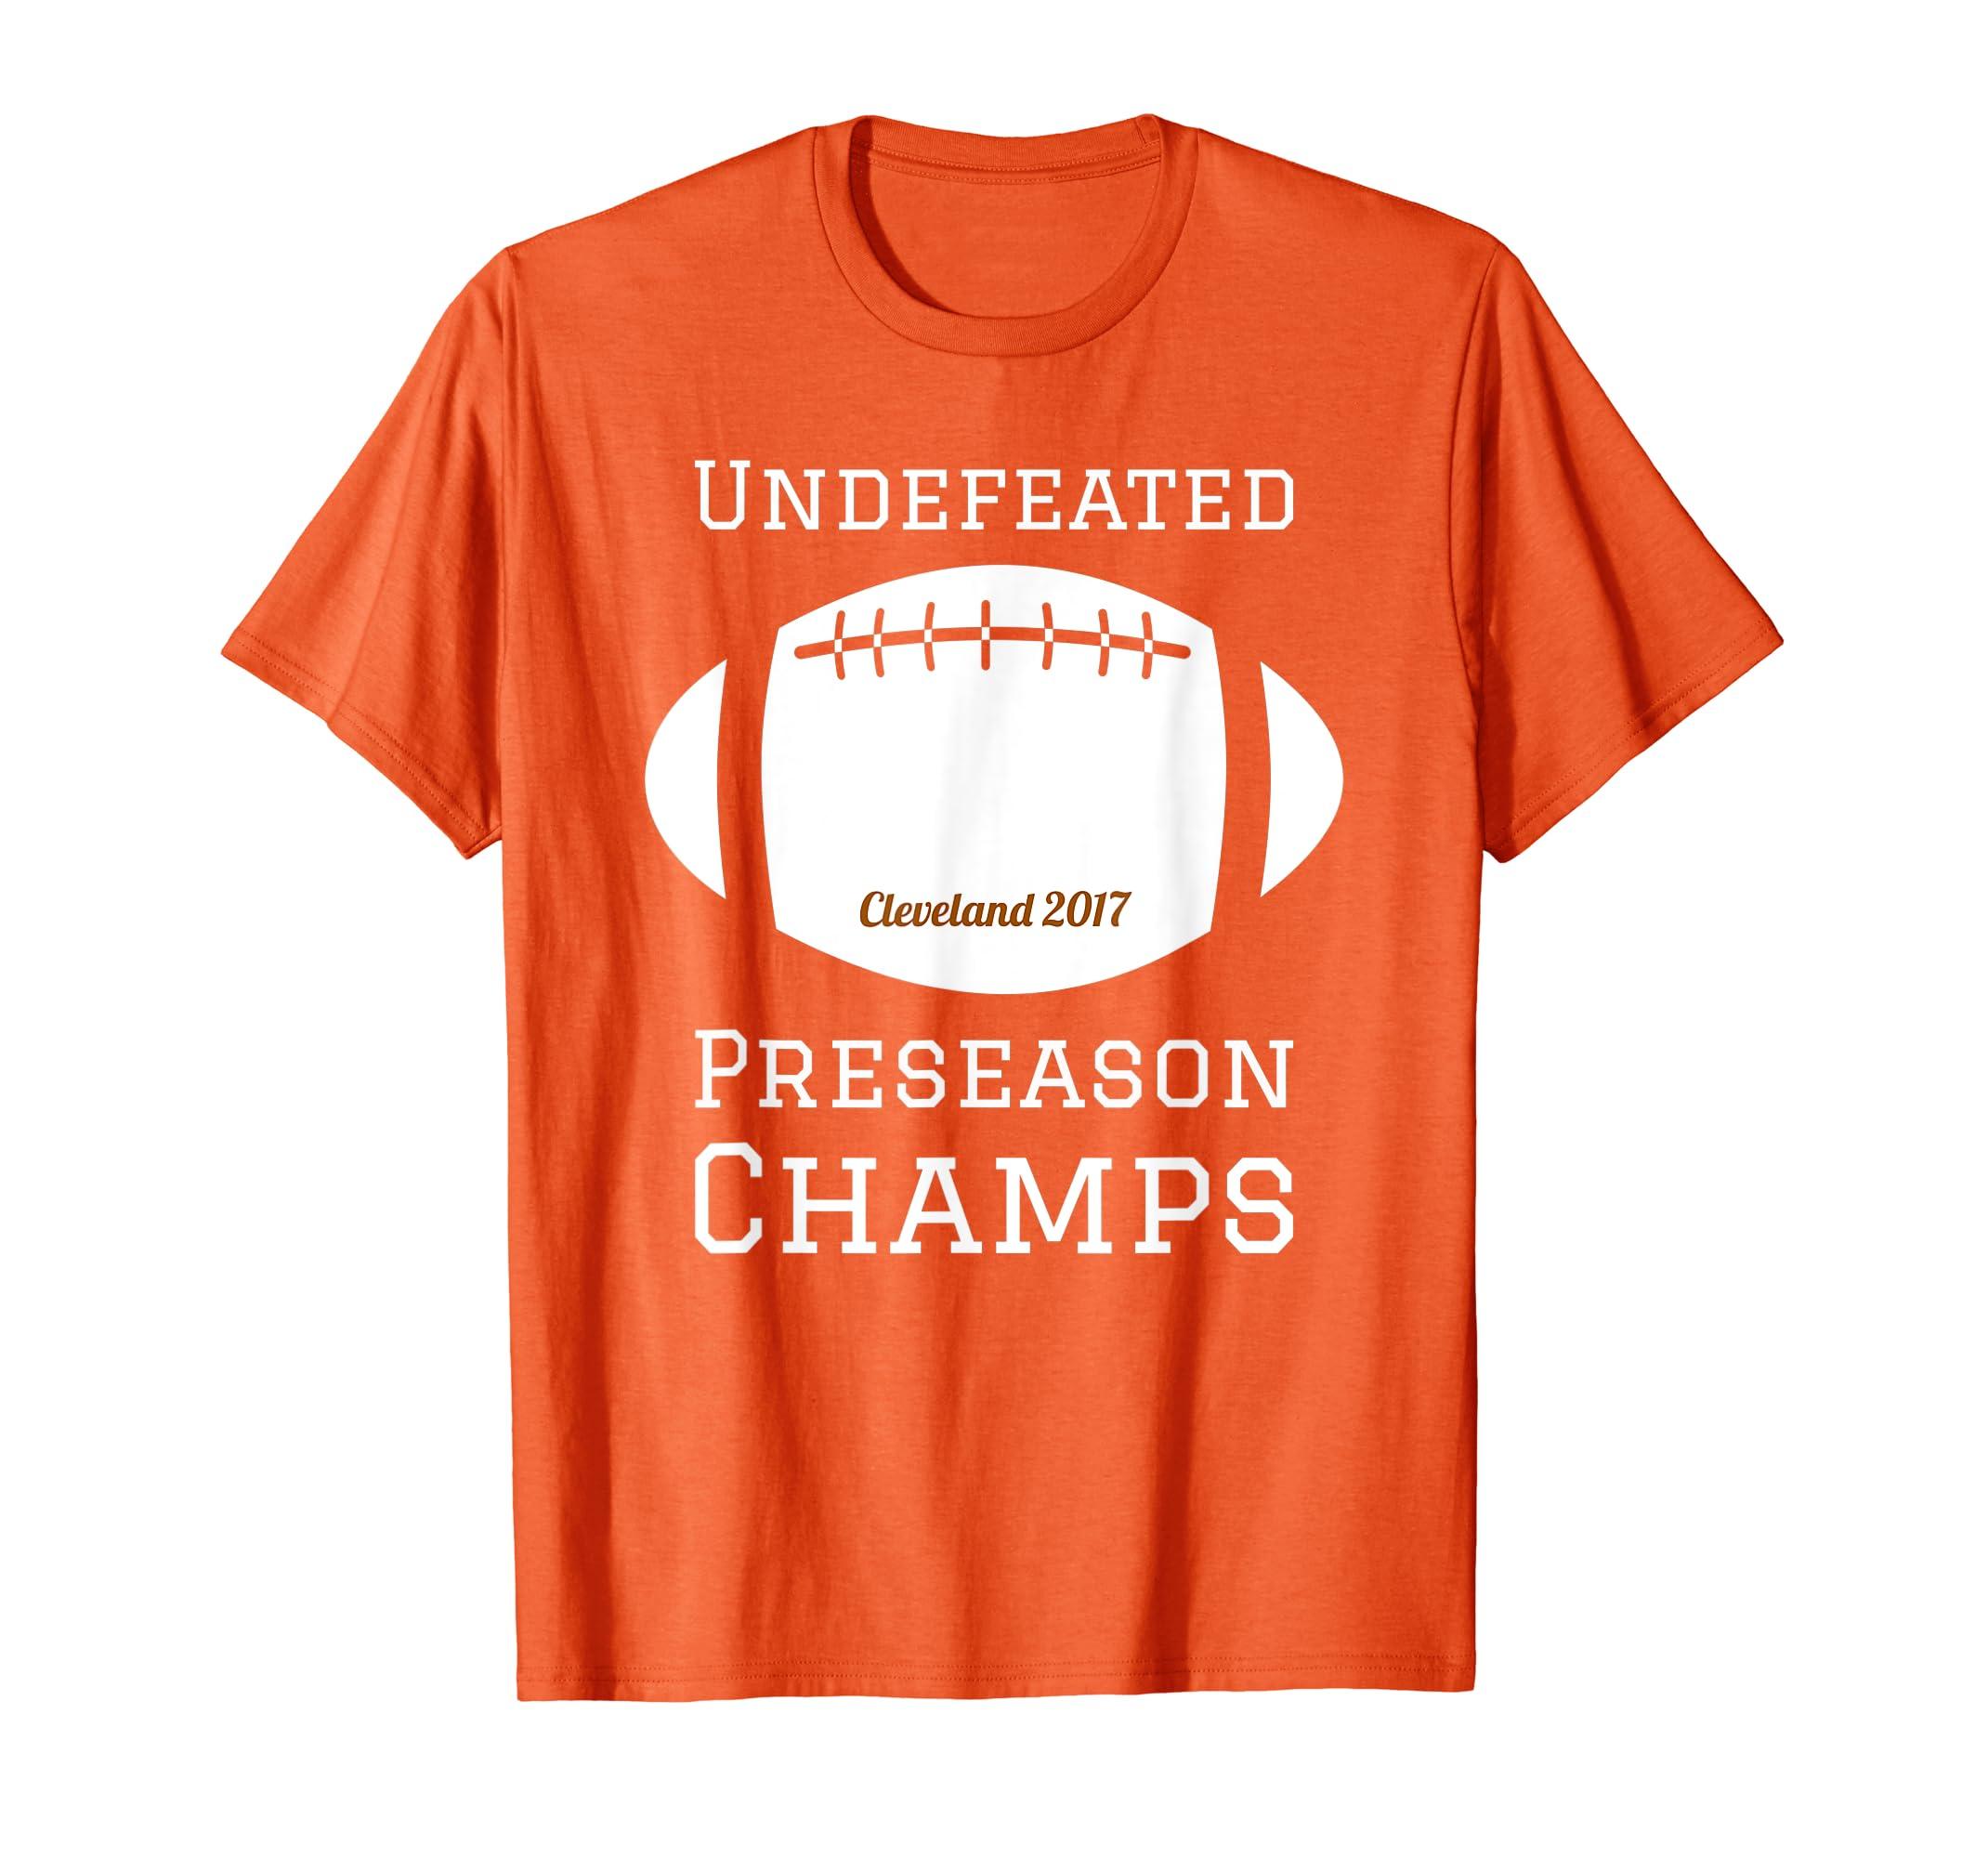 878440c684ba Amazon.com  Undefeated Preseason Champs Football 2017 t-shirt  Clothing